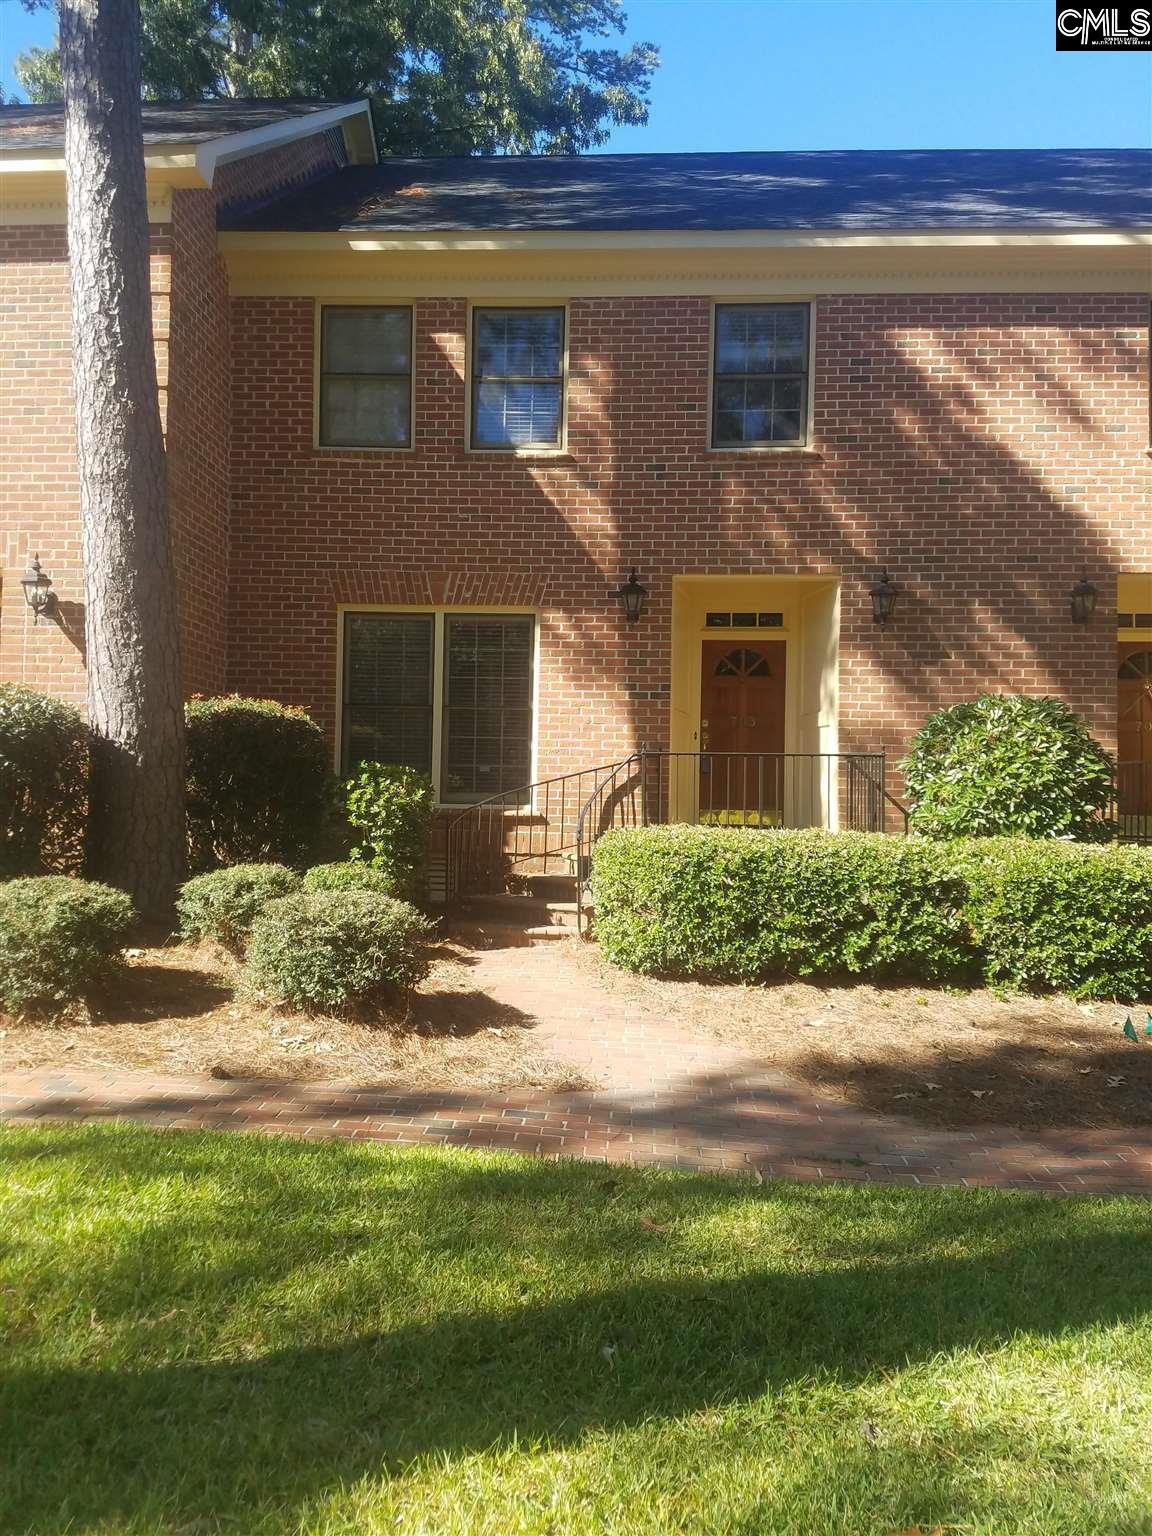 703 Poinsettia Columbia, SC 29205